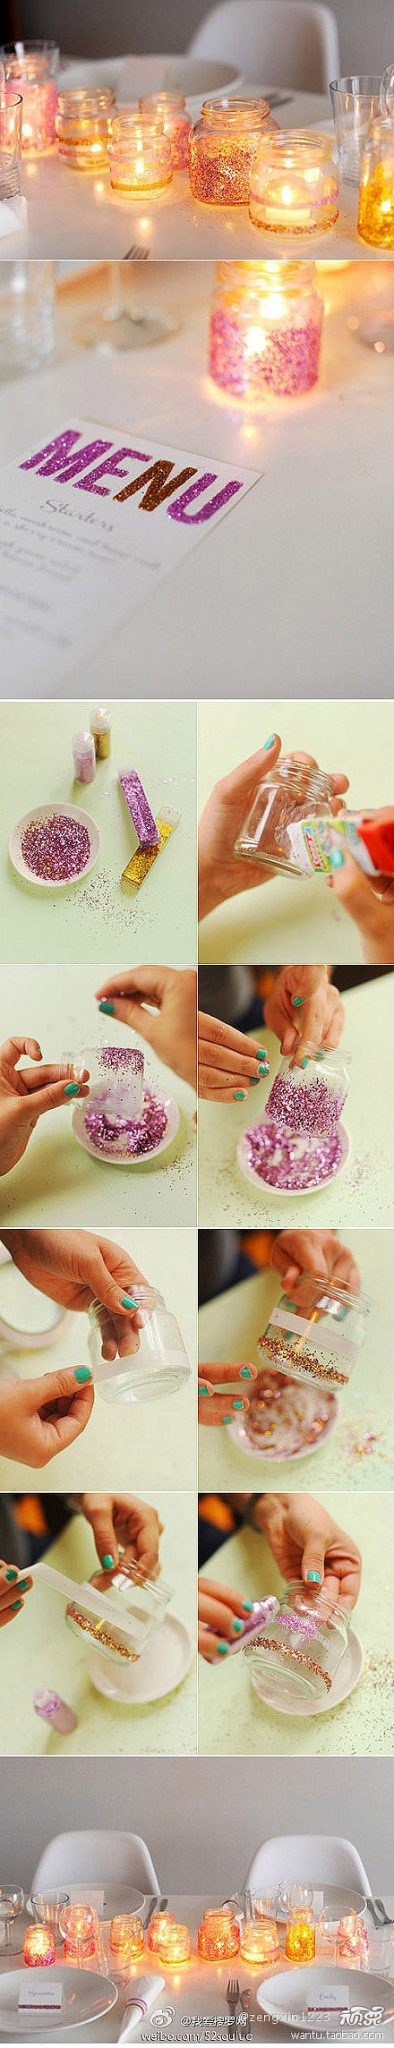 DIY Glitter Candles Ideas